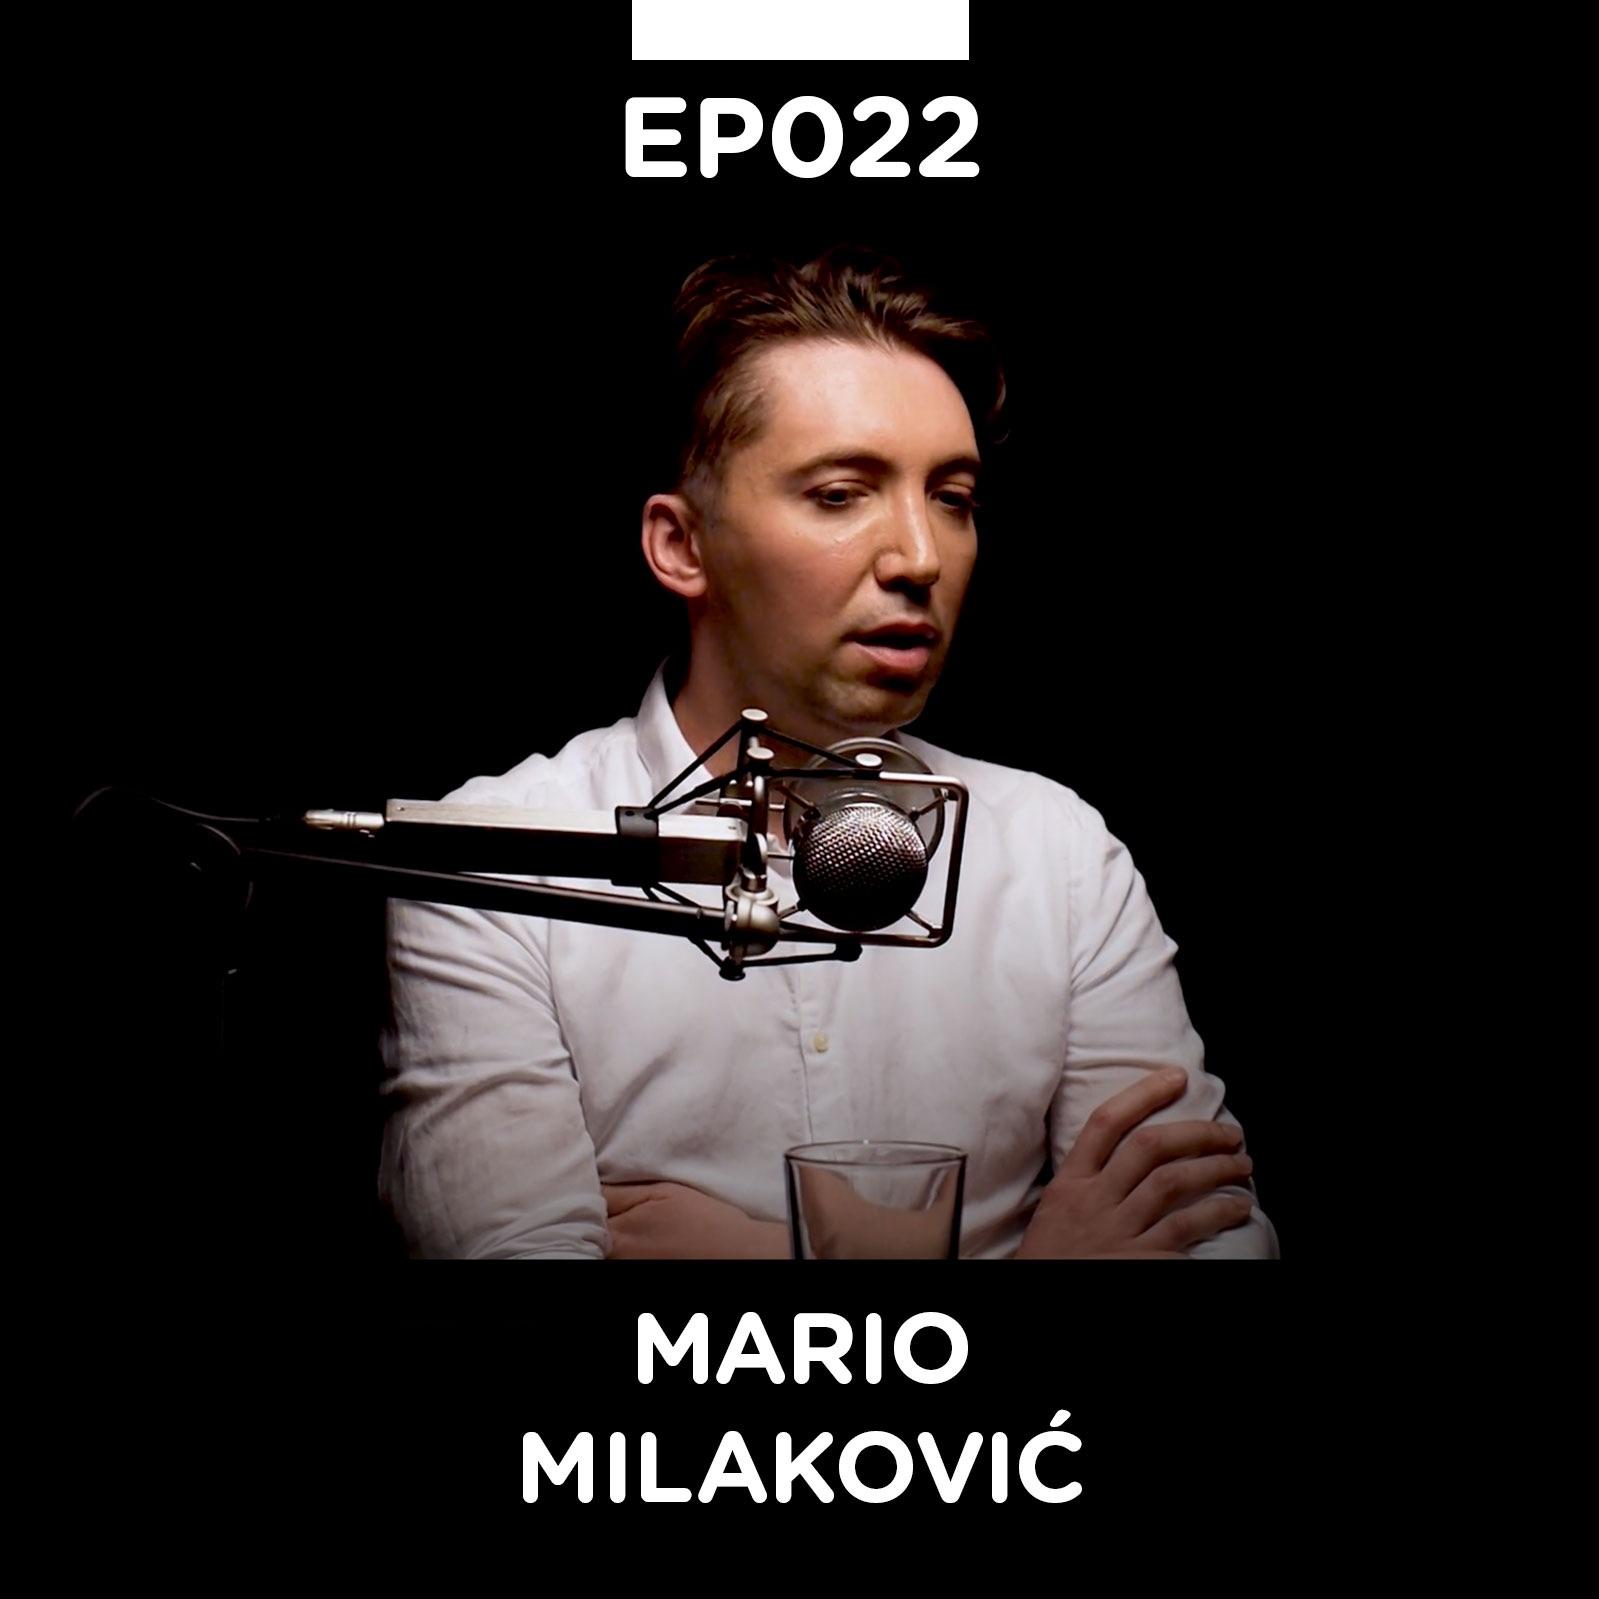 EP 022: Mario Milaković - Pojačalo podcast